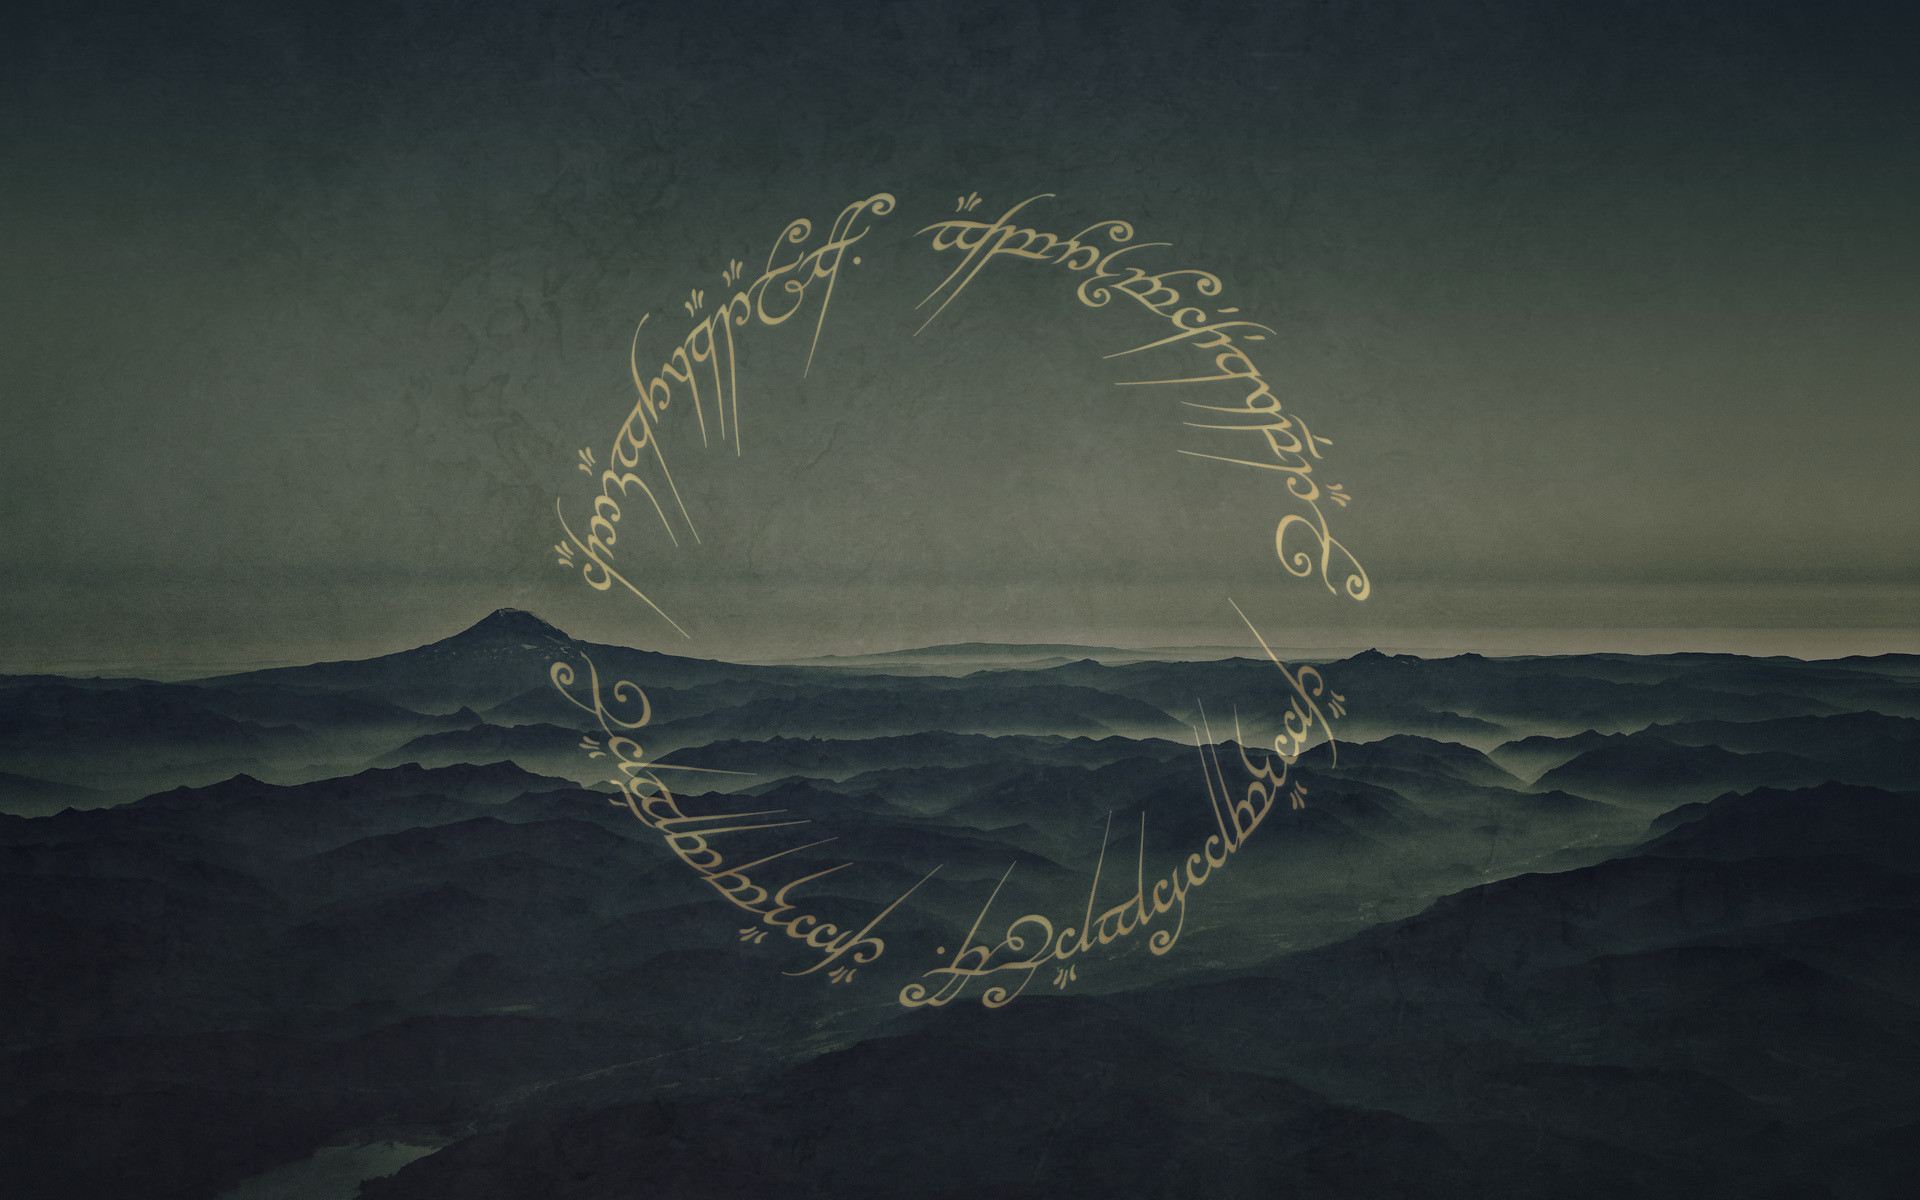 Tolkien esque wallpaper for the Hobbit movie [1920x1200] [oc] i 1920x1200